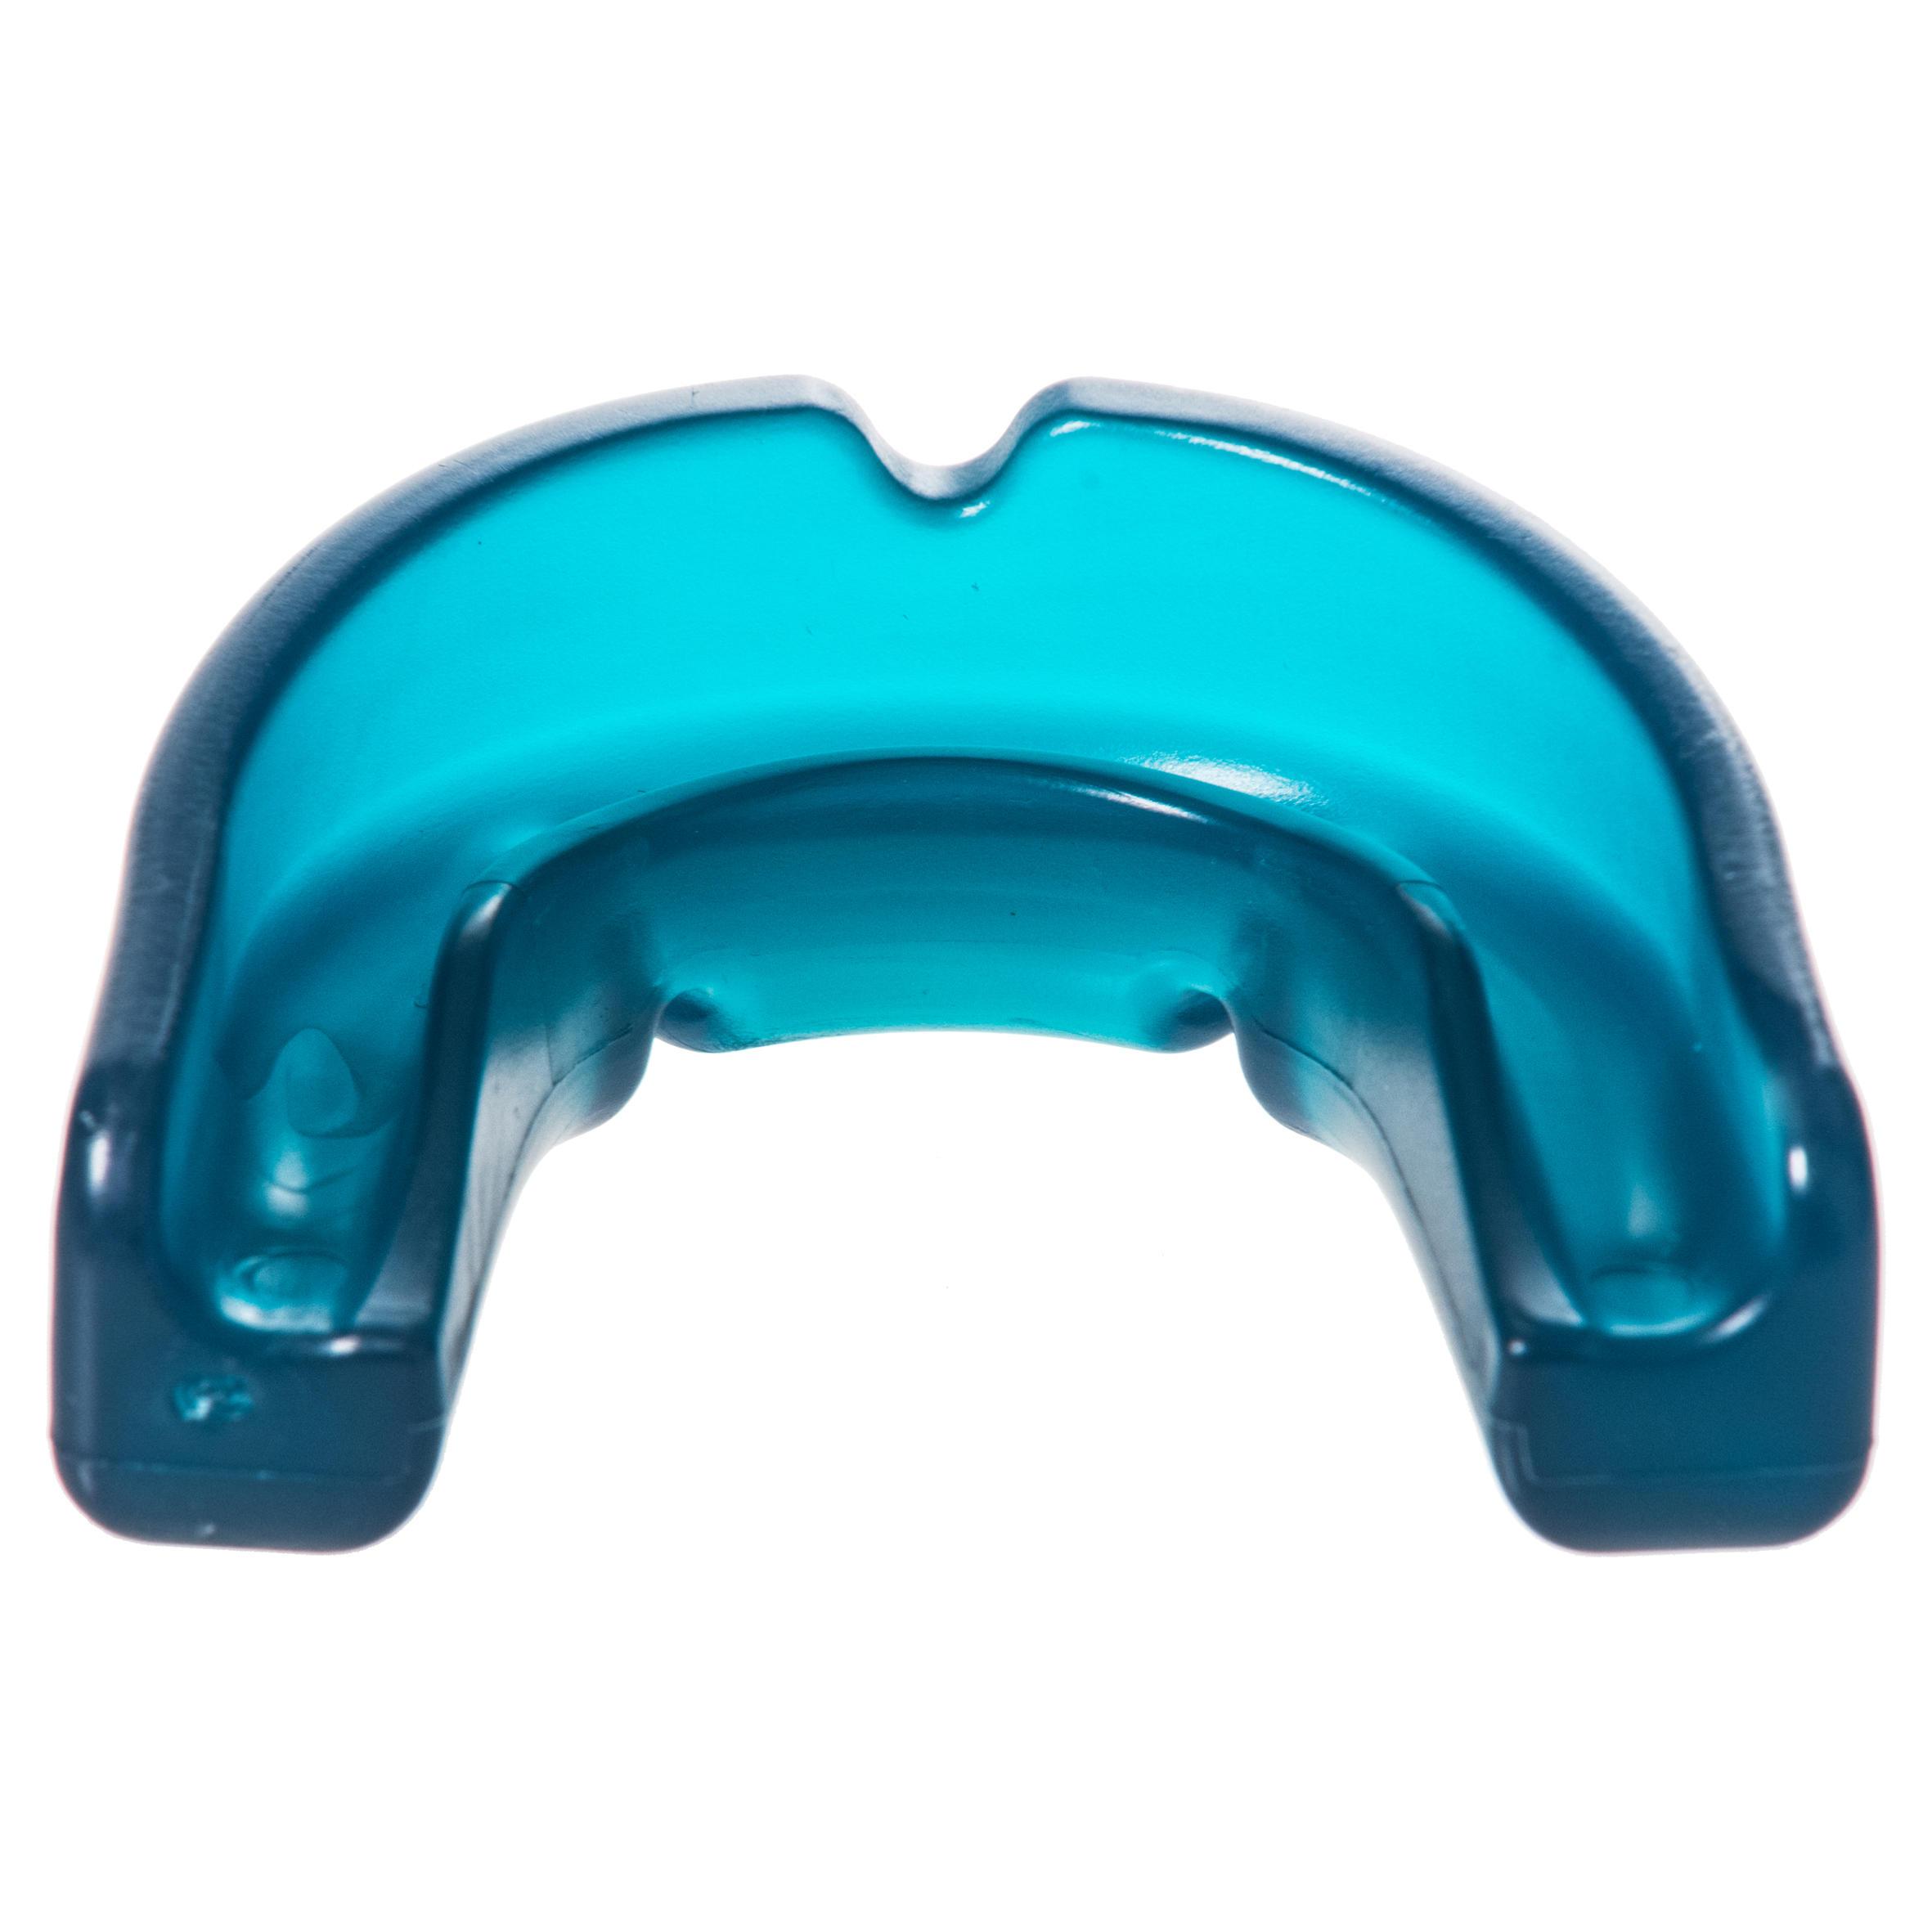 Kipsta Hockeybitje laagintensief volwassenen FH100 turquoise